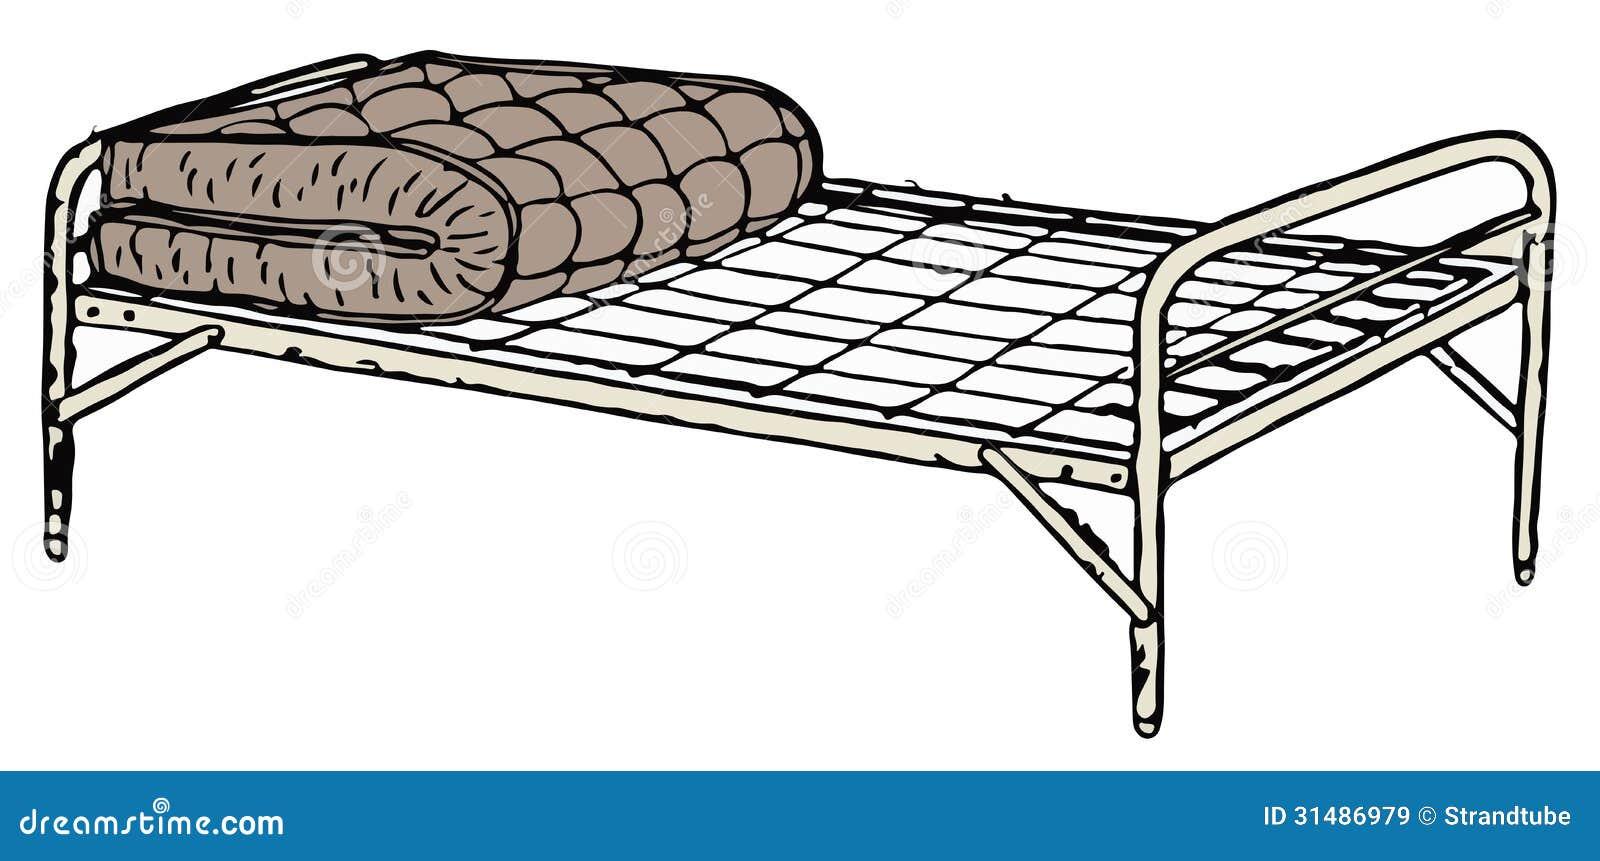 altes feldbett bett stock abbildung bild von antike 31486979. Black Bedroom Furniture Sets. Home Design Ideas